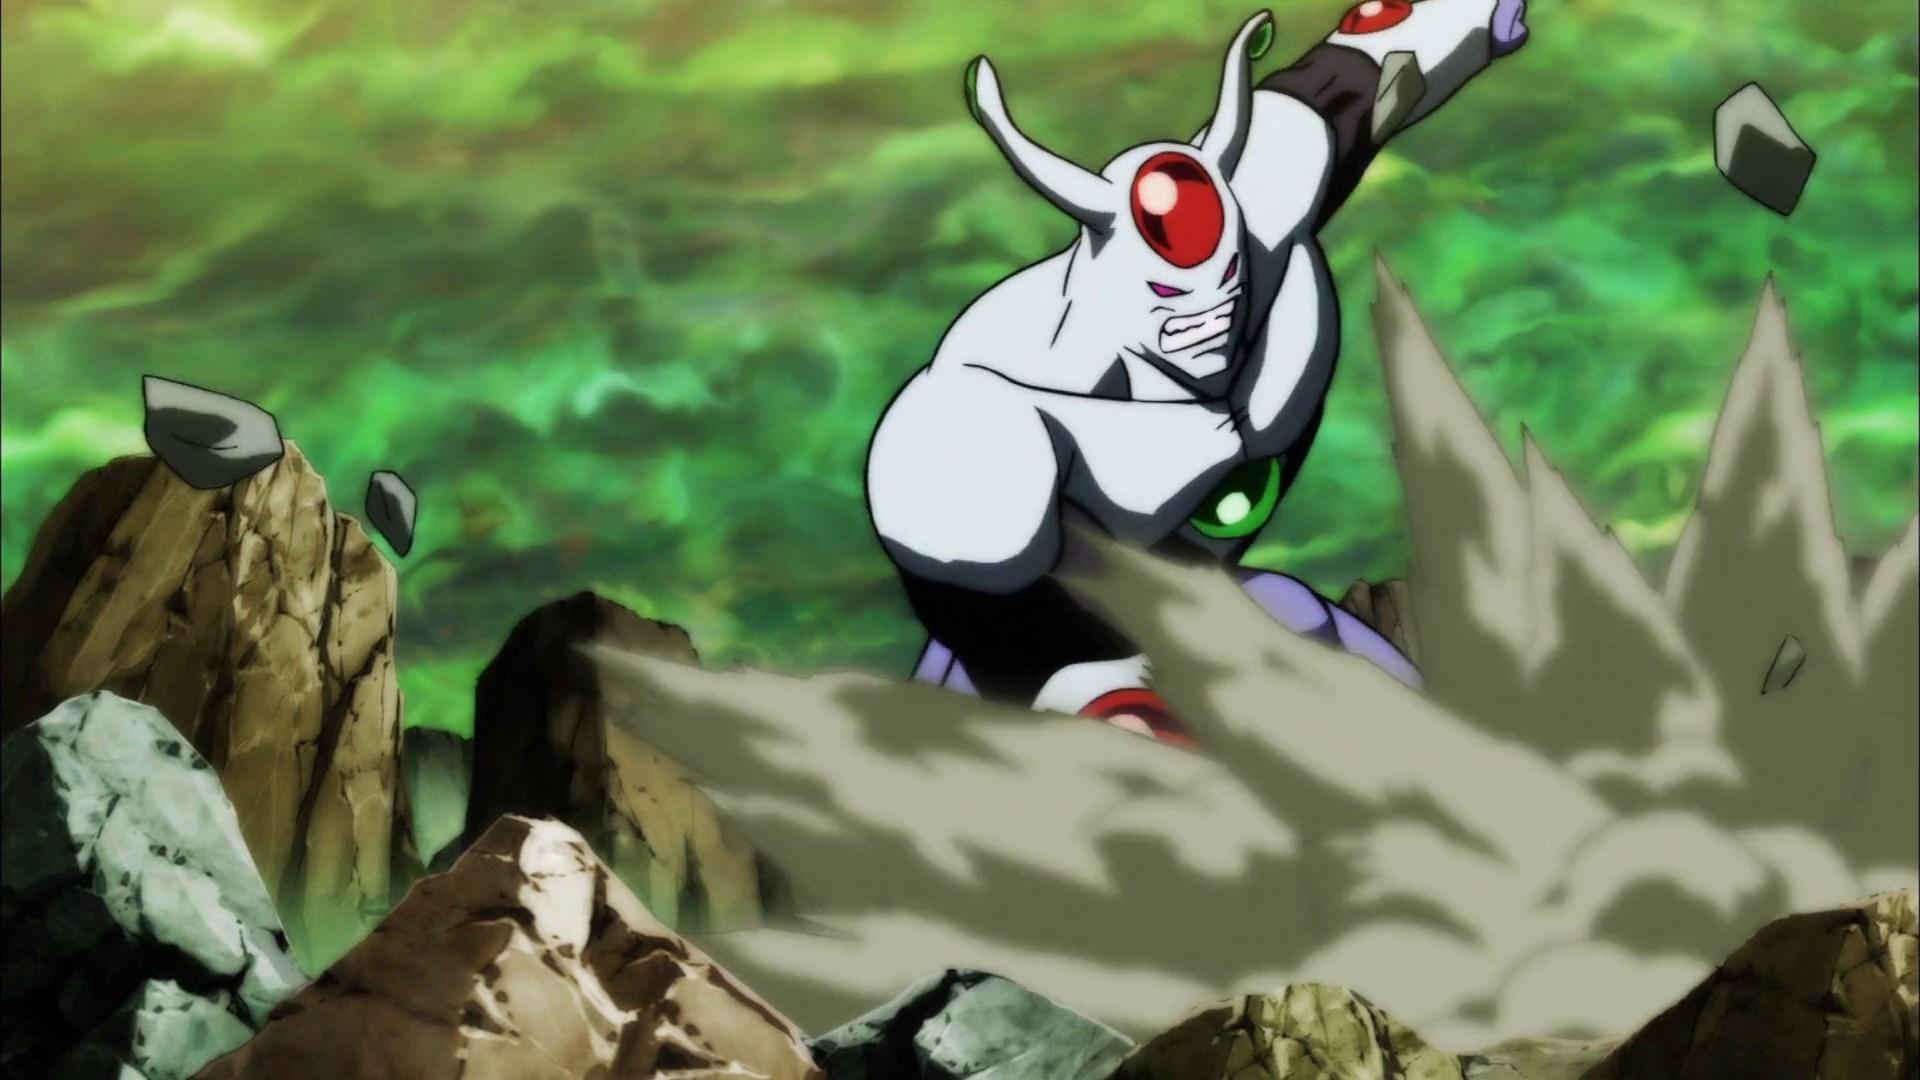 [HorribleSubs] Dragon Ball Super - 121 [1080p].mkv_snapshot_13.09